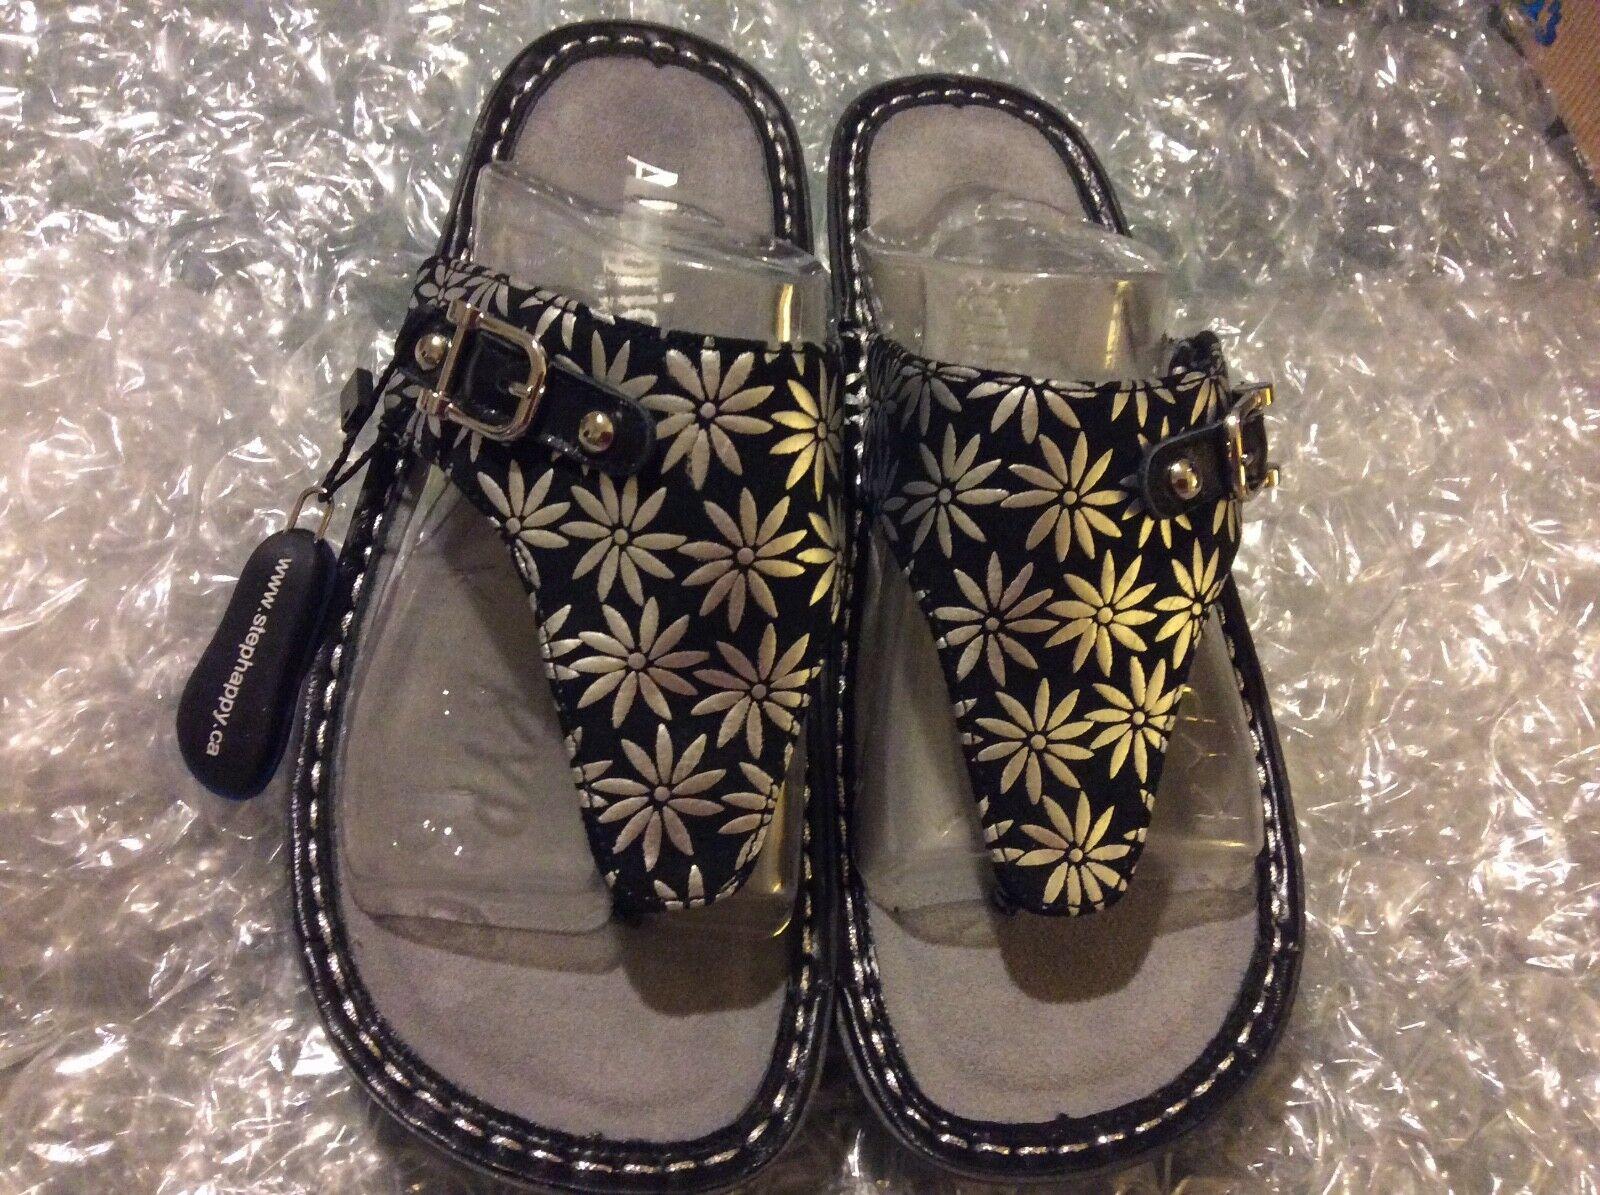 ALGRIA VANNESSA VAN -321 GERBER DAISY nero  argento Thong  Sandal EU 37 US 7 (4500)  shopping online di moda